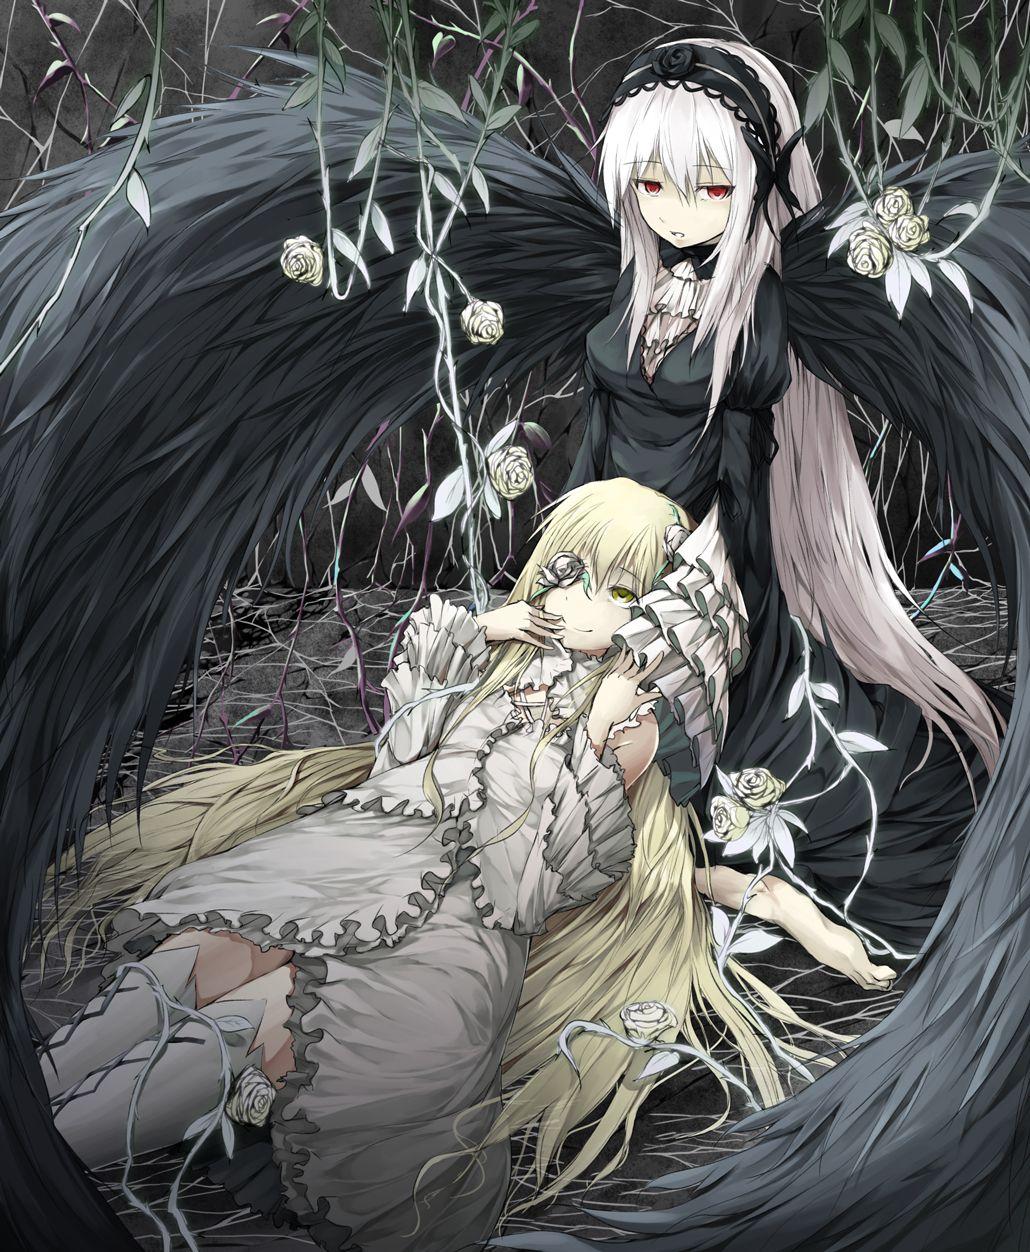 Rozen Maiden Manga gothique, Dessin manga, Dessin